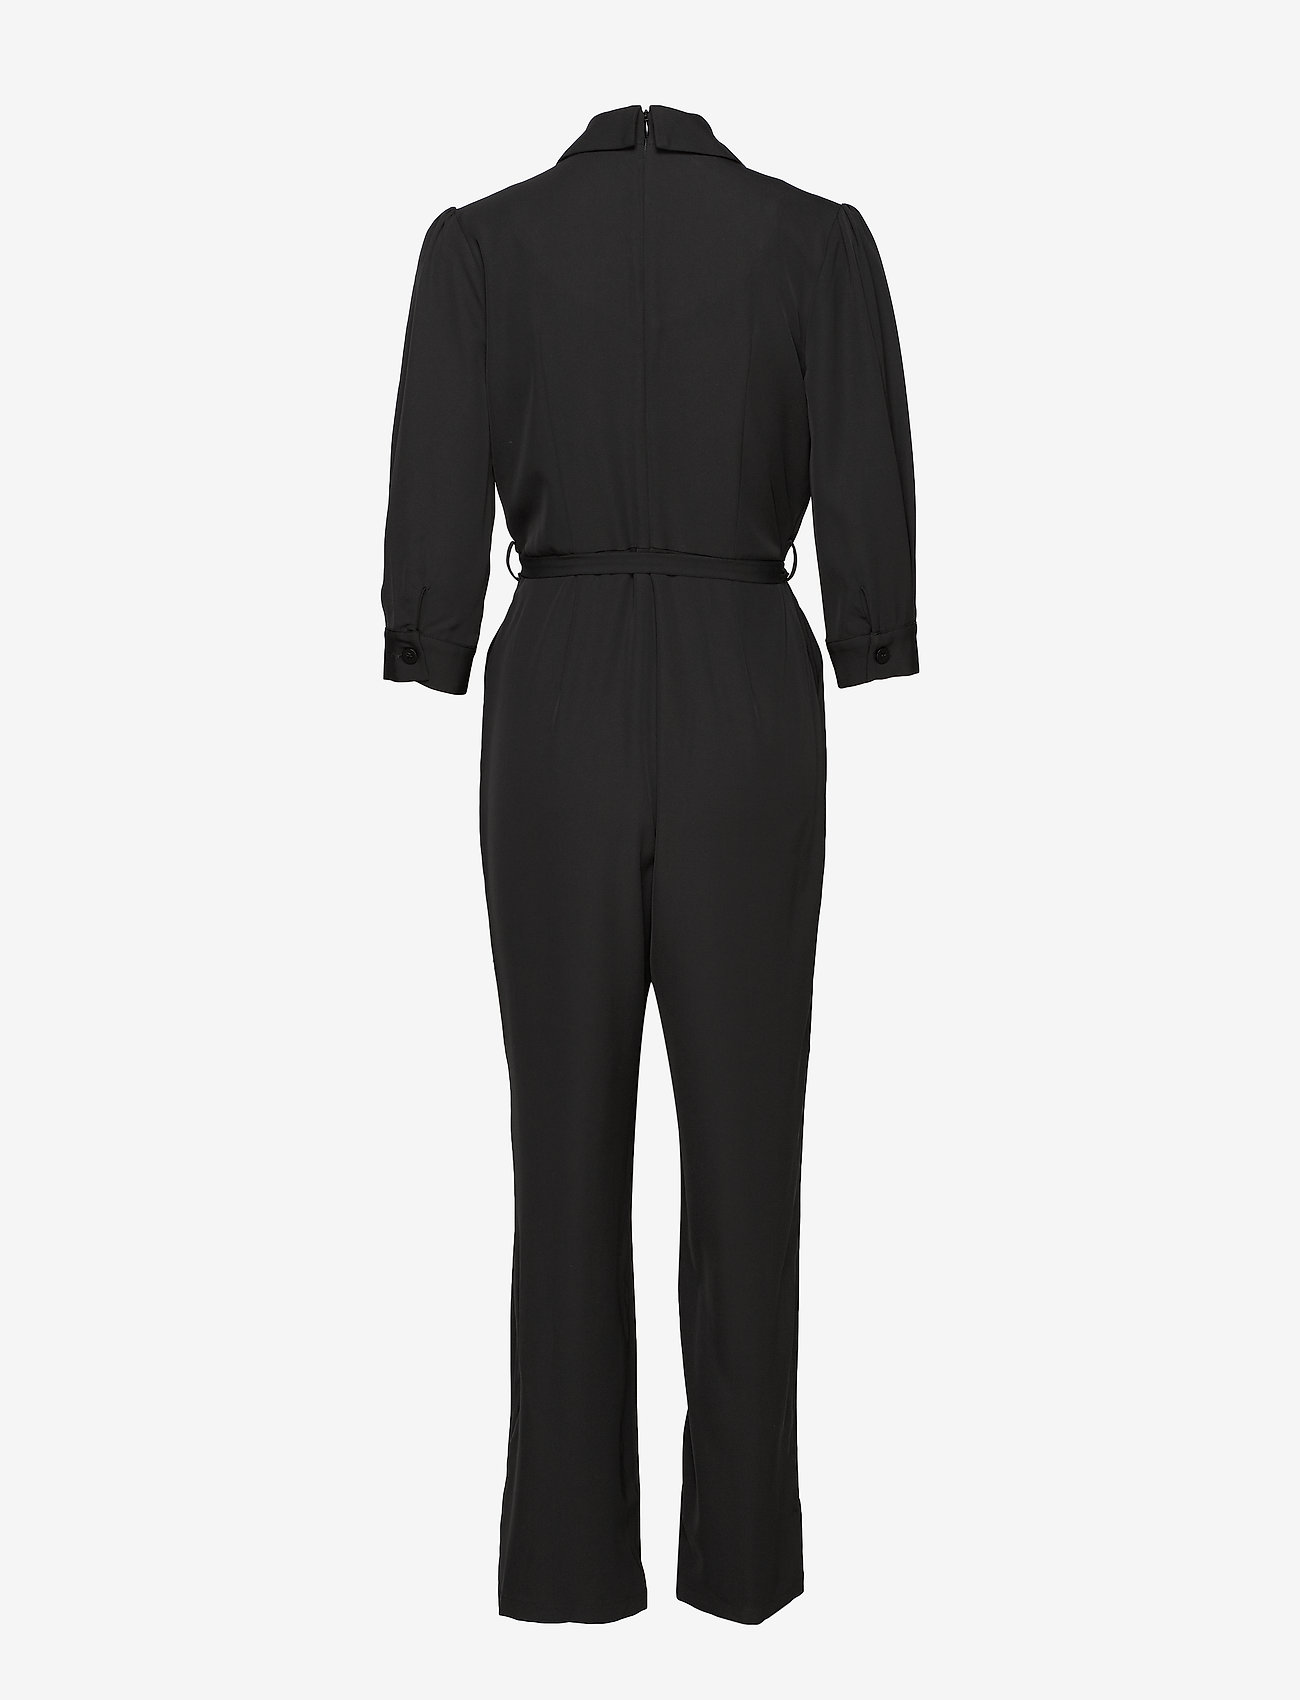 Minus - Violetta jumpsuit - jumpsuits - sort - 1